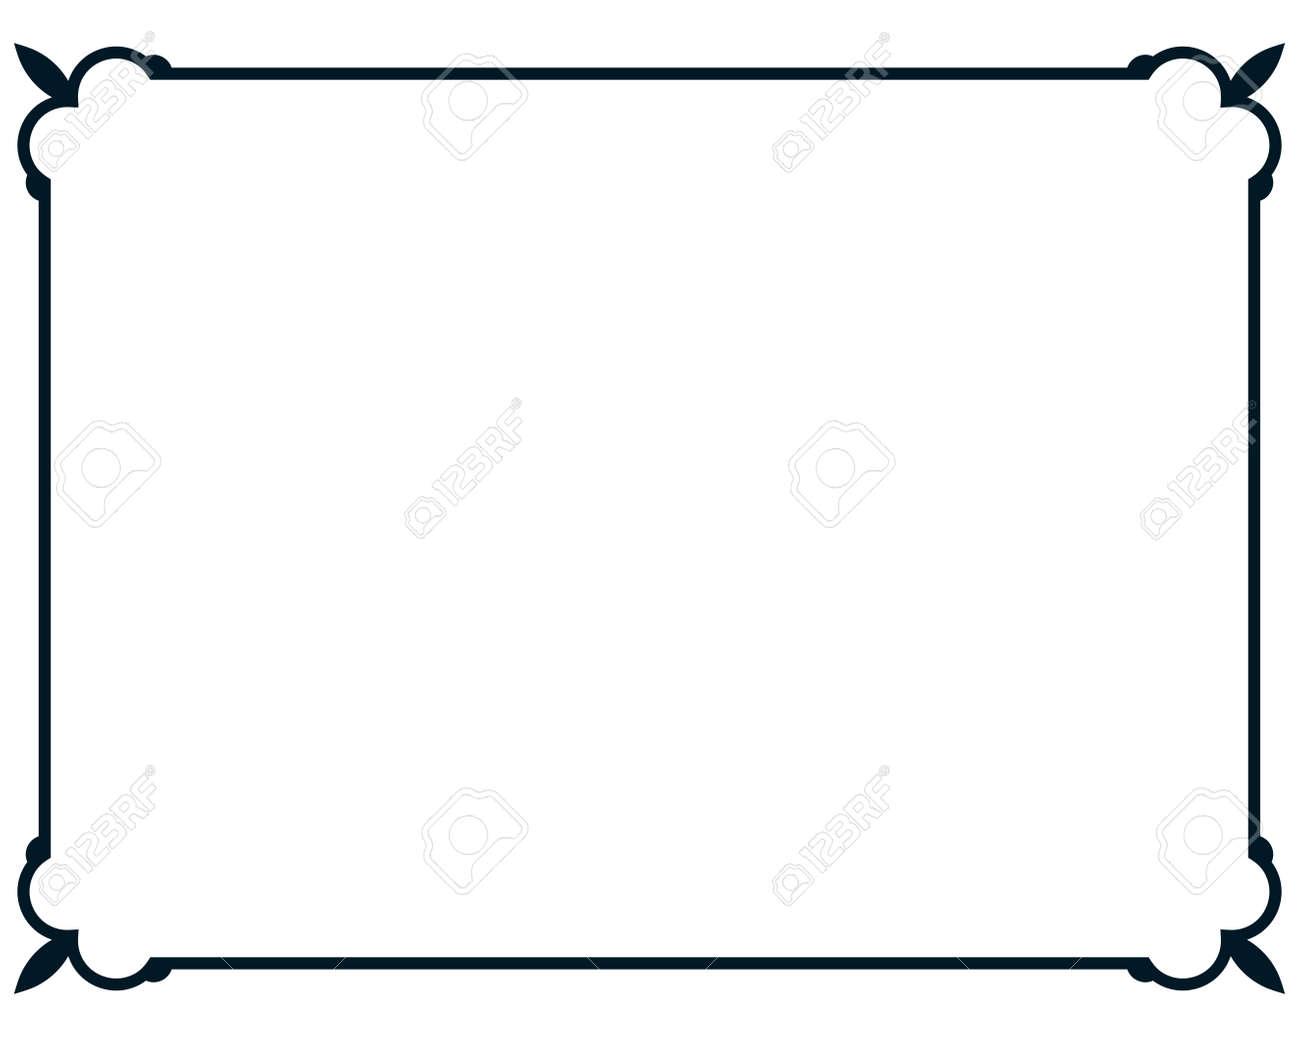 border frame line deco vector label simple royalty free cliparts rh 123rf com border vector free border vectors vecteezy